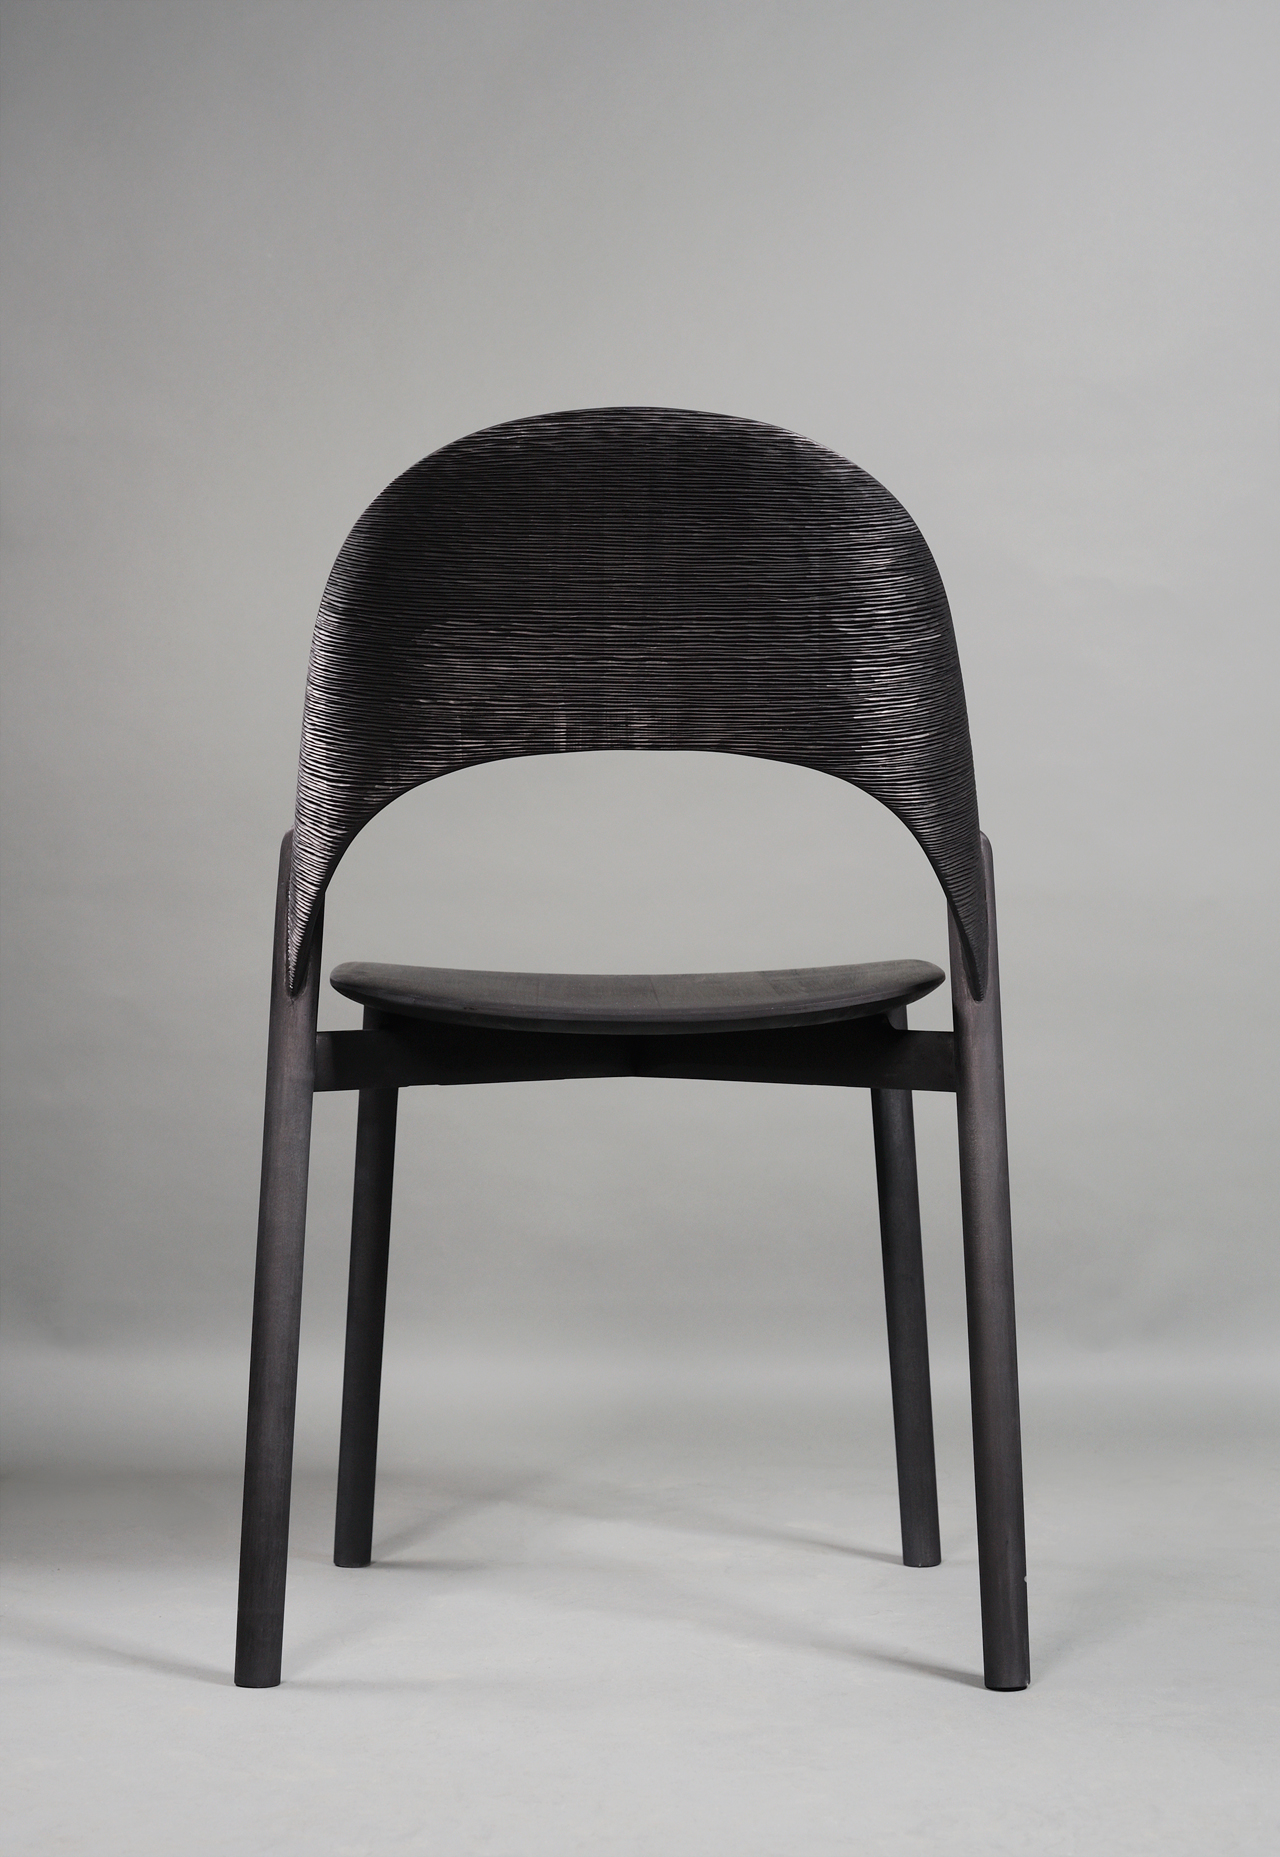 Sana Chair by Monica Förster for Zanat